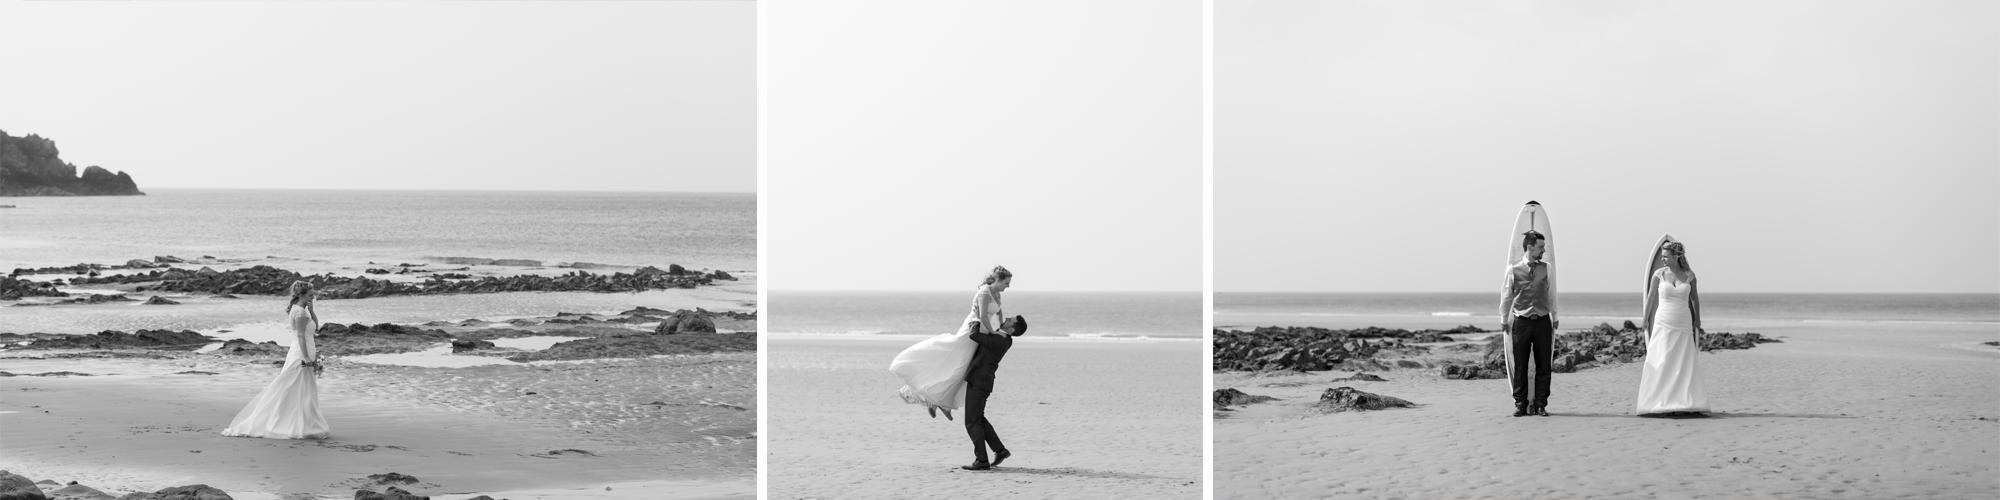 studio-colas-photographe-mariage_caen_plage